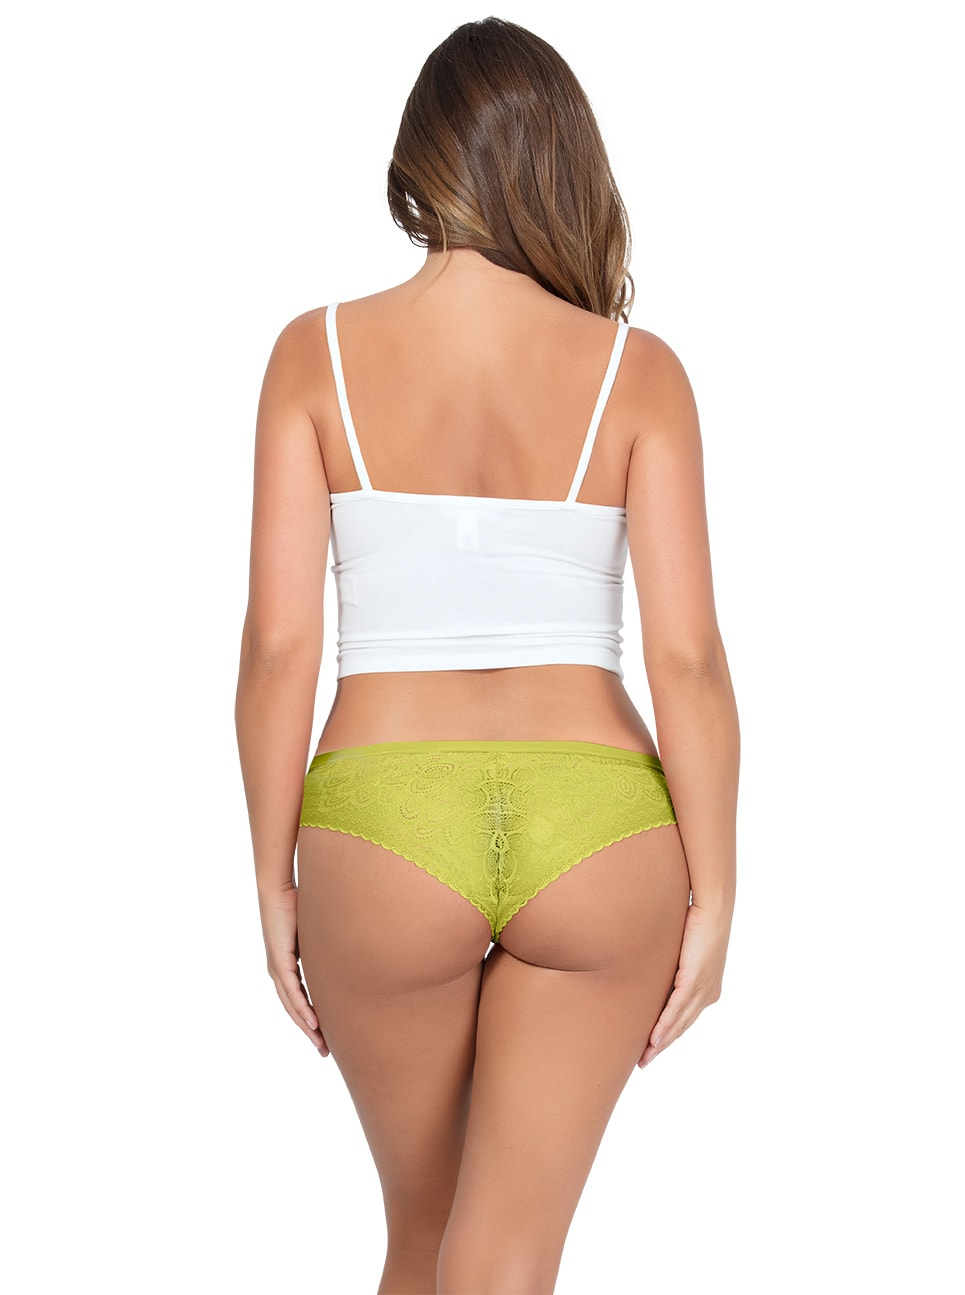 PARFAIT ParfaitPanty SoGlam BikiniPP302 Lemonade Back2 copy 2 - Panty So Glam Bikini - Lemonade - PP302